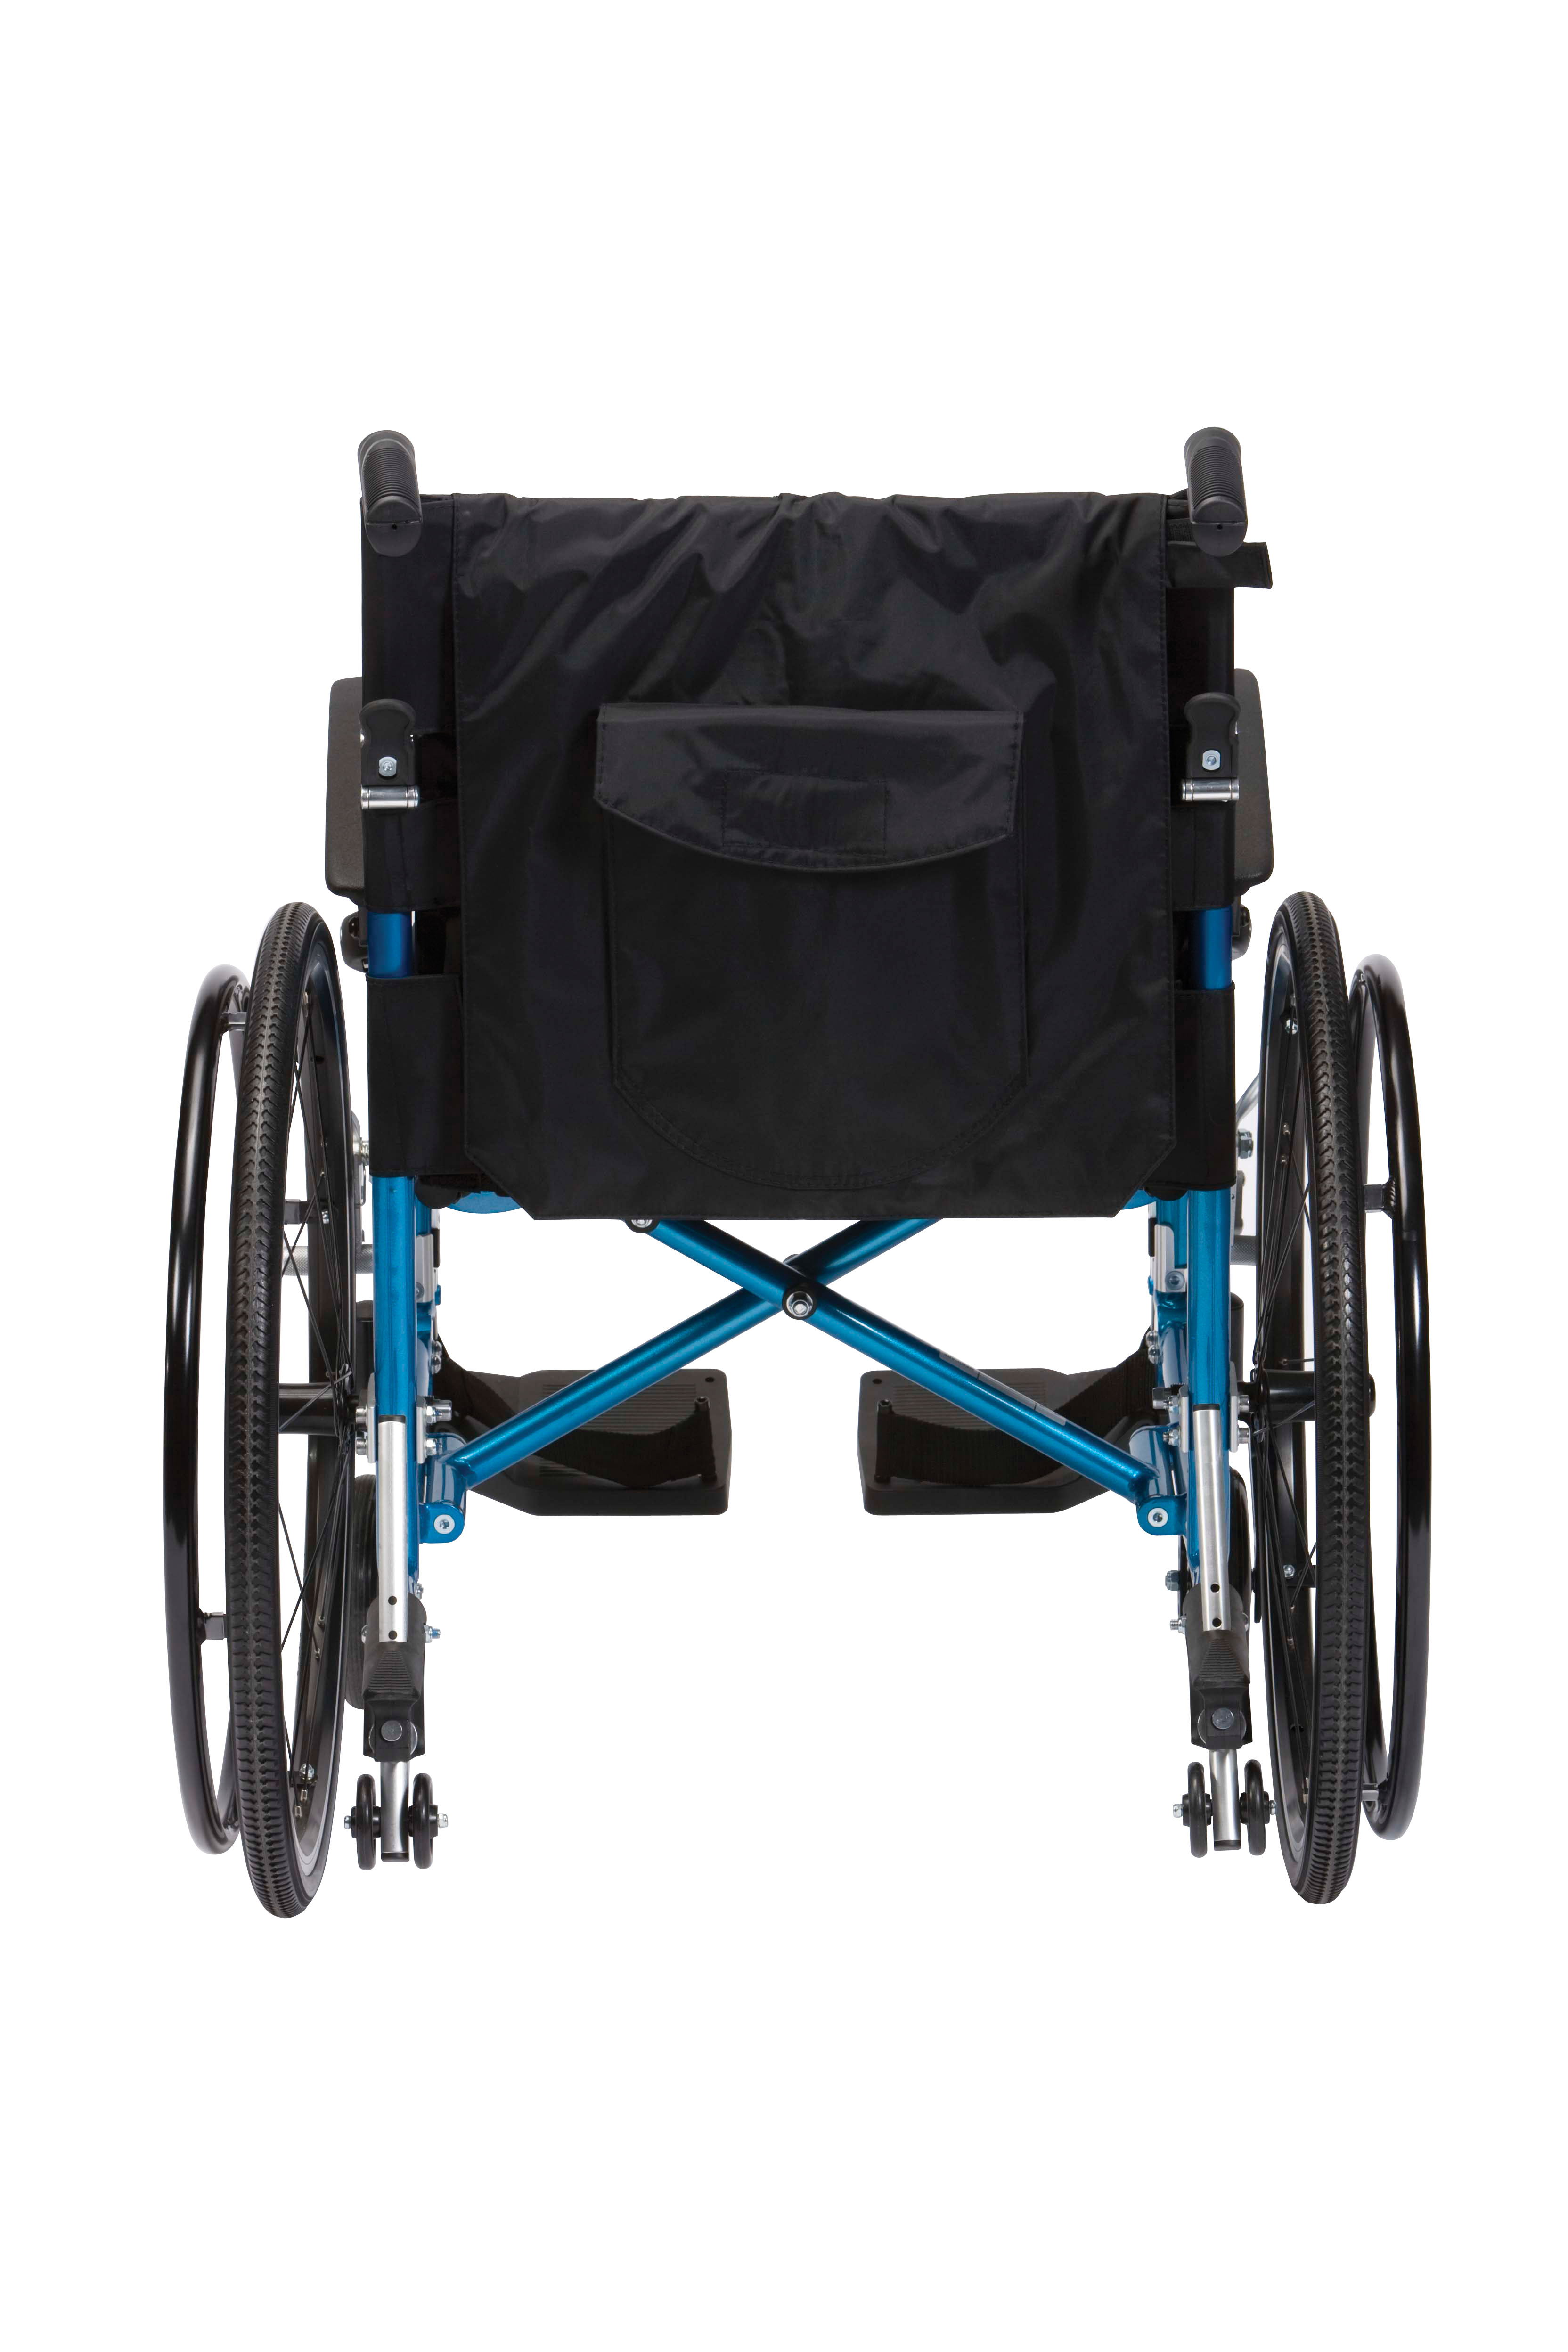 enigma-spirit-wheelchair-xses18bl-drive-medical-2.jpg